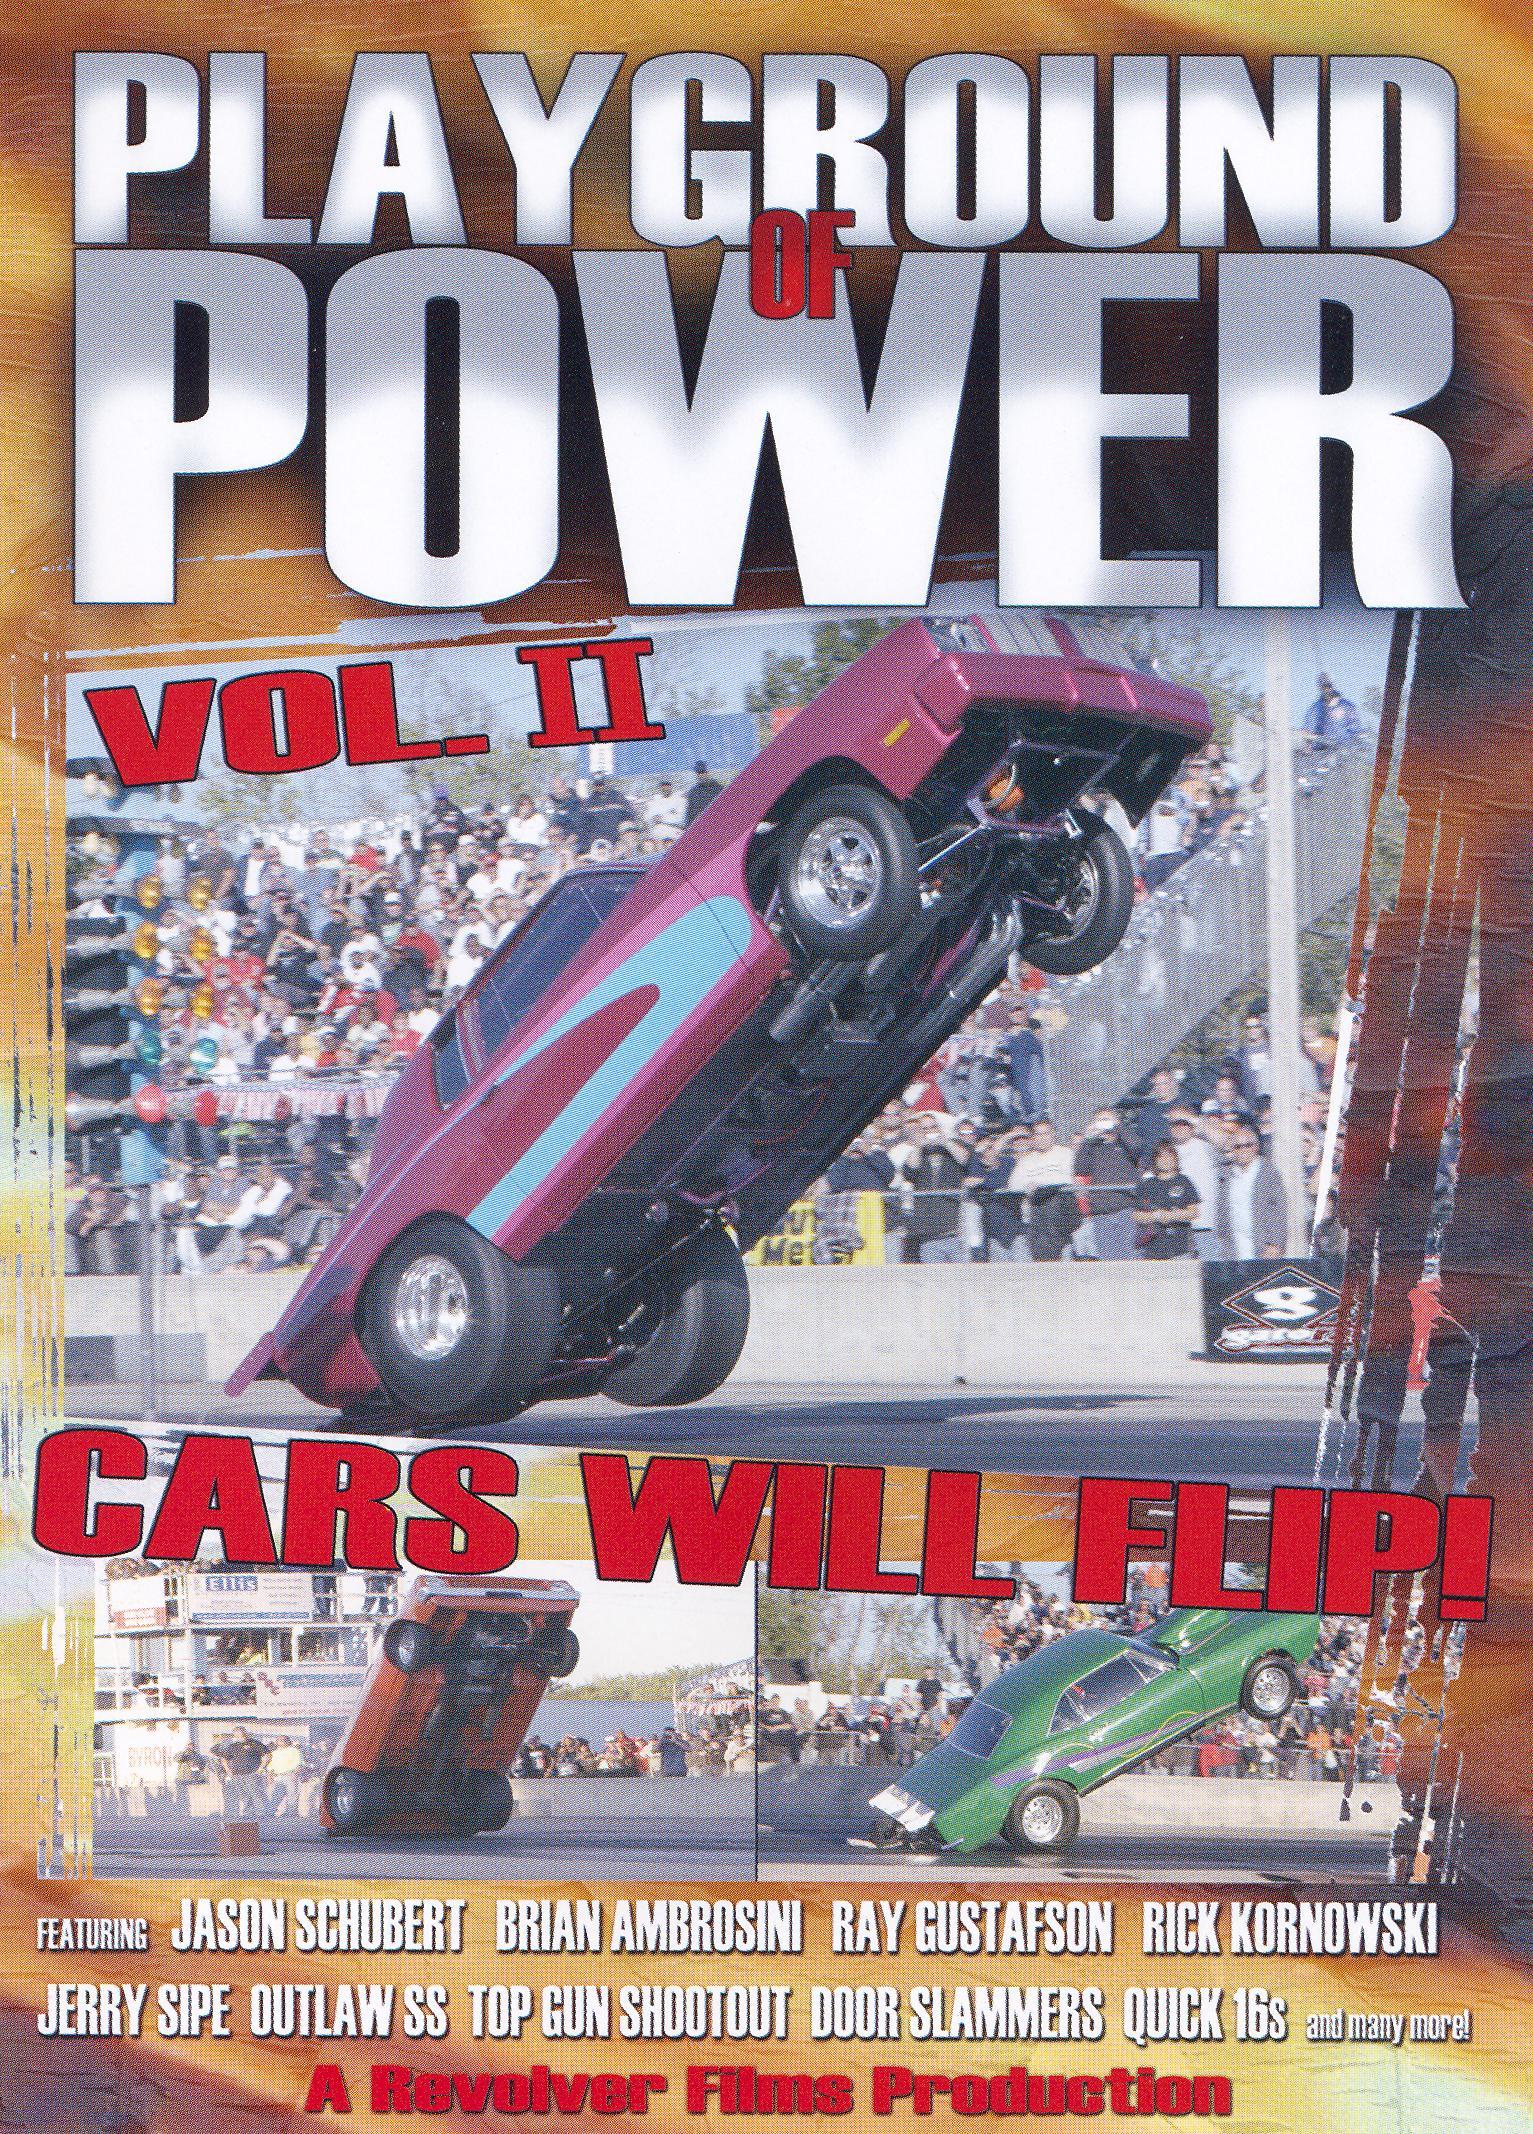 Playground of Power, Vol. 2